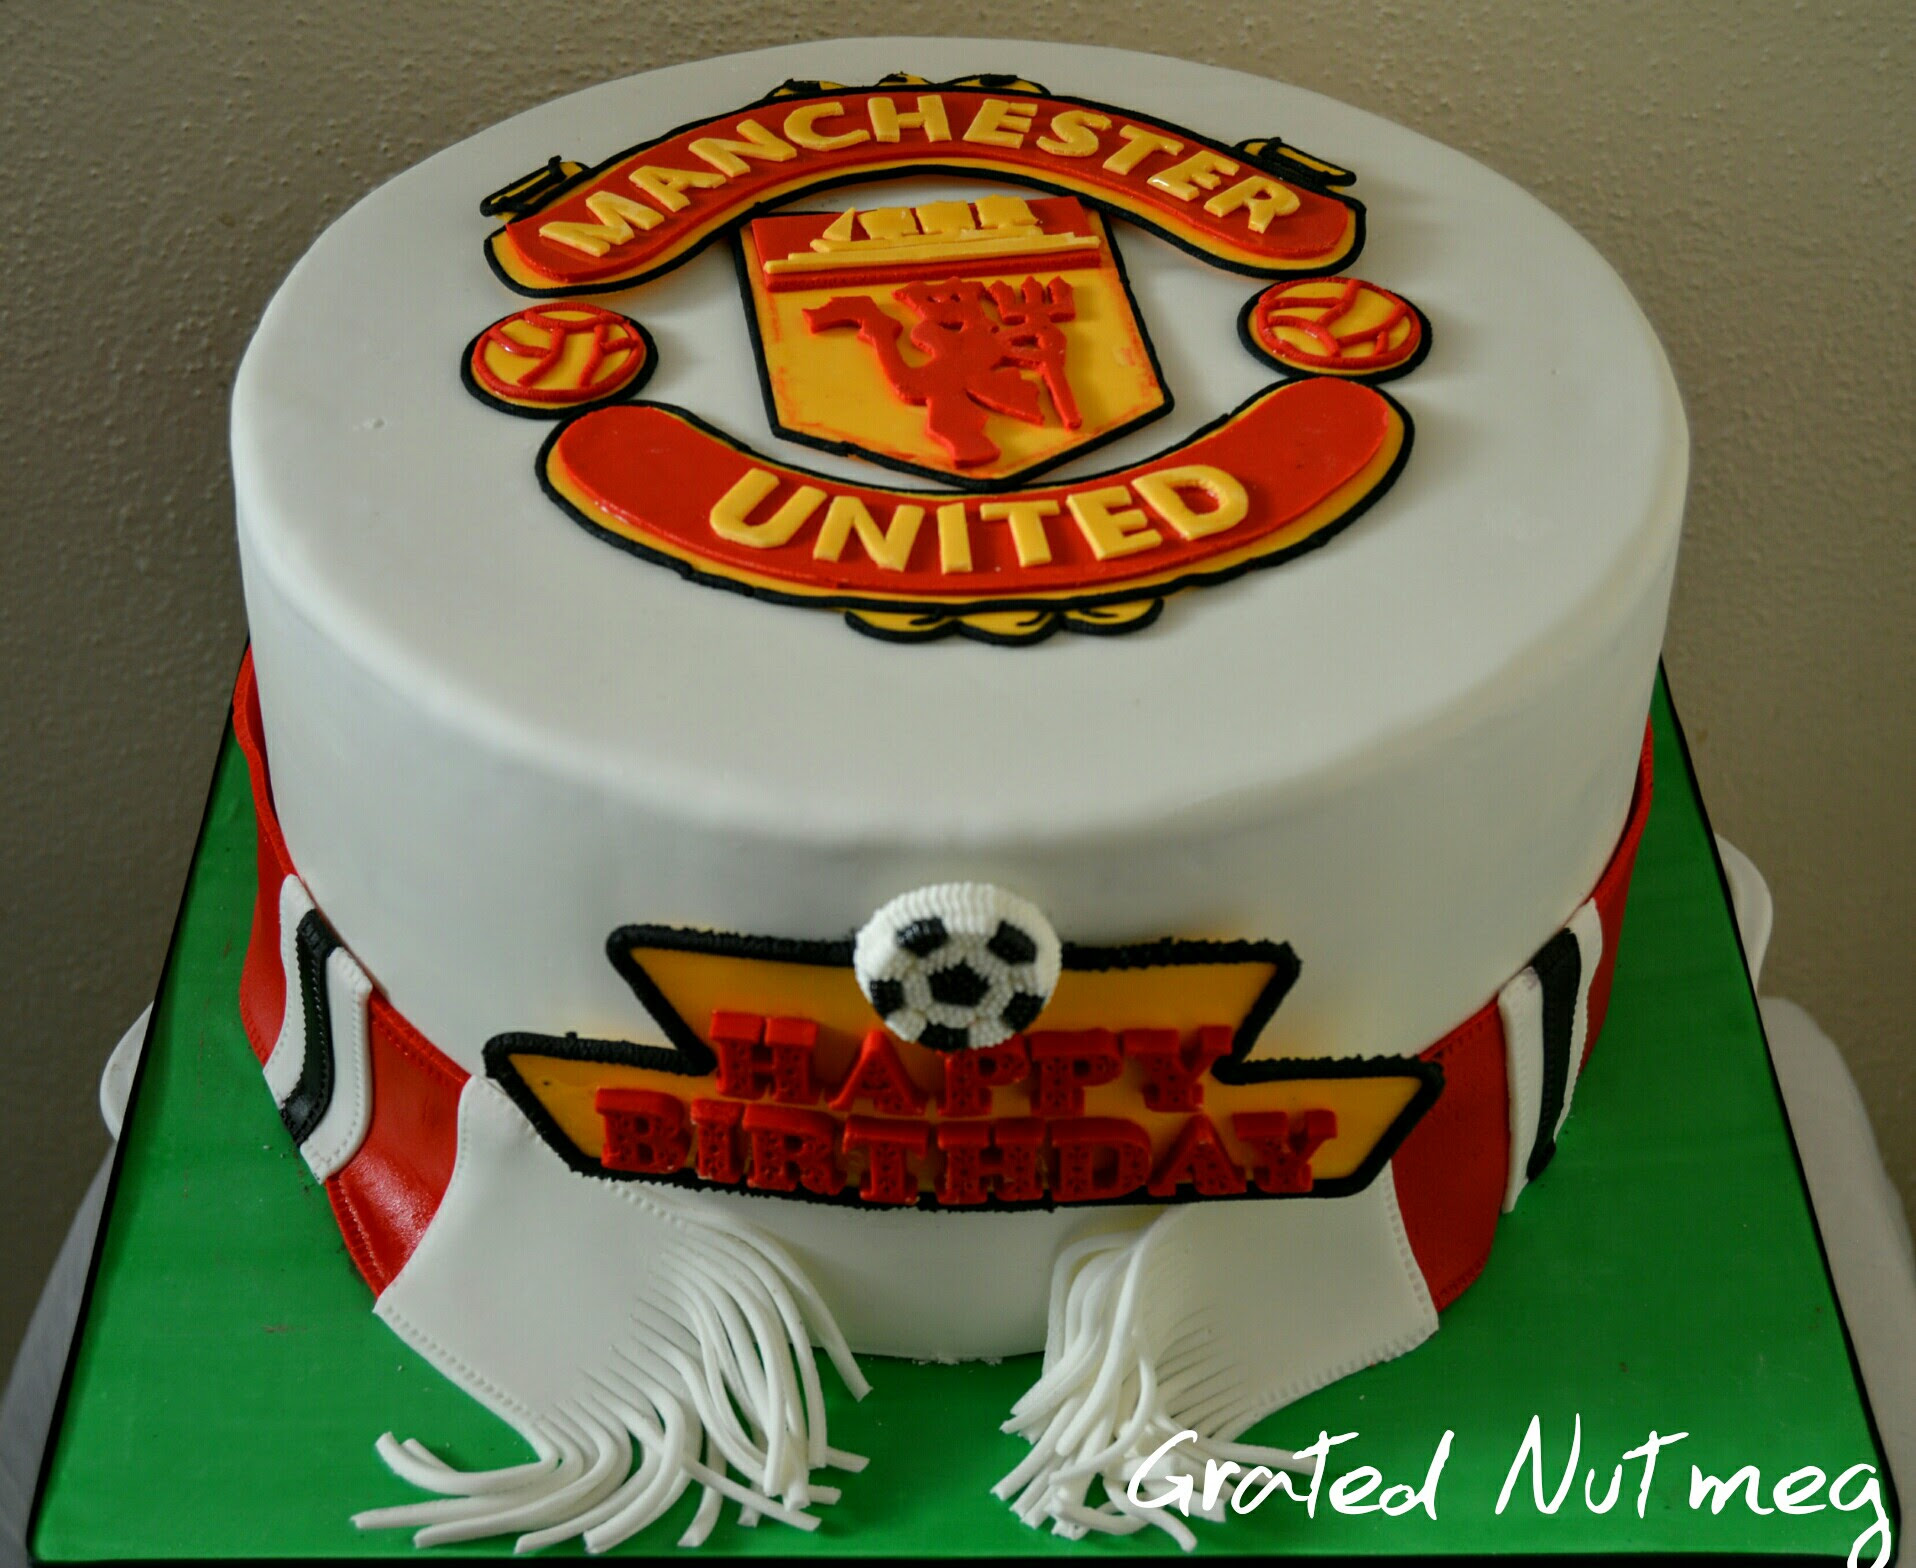 Excellent Football Birthday Cakes For Men Top Birthday Cake Pictures Funny Birthday Cards Online Elaedamsfinfo